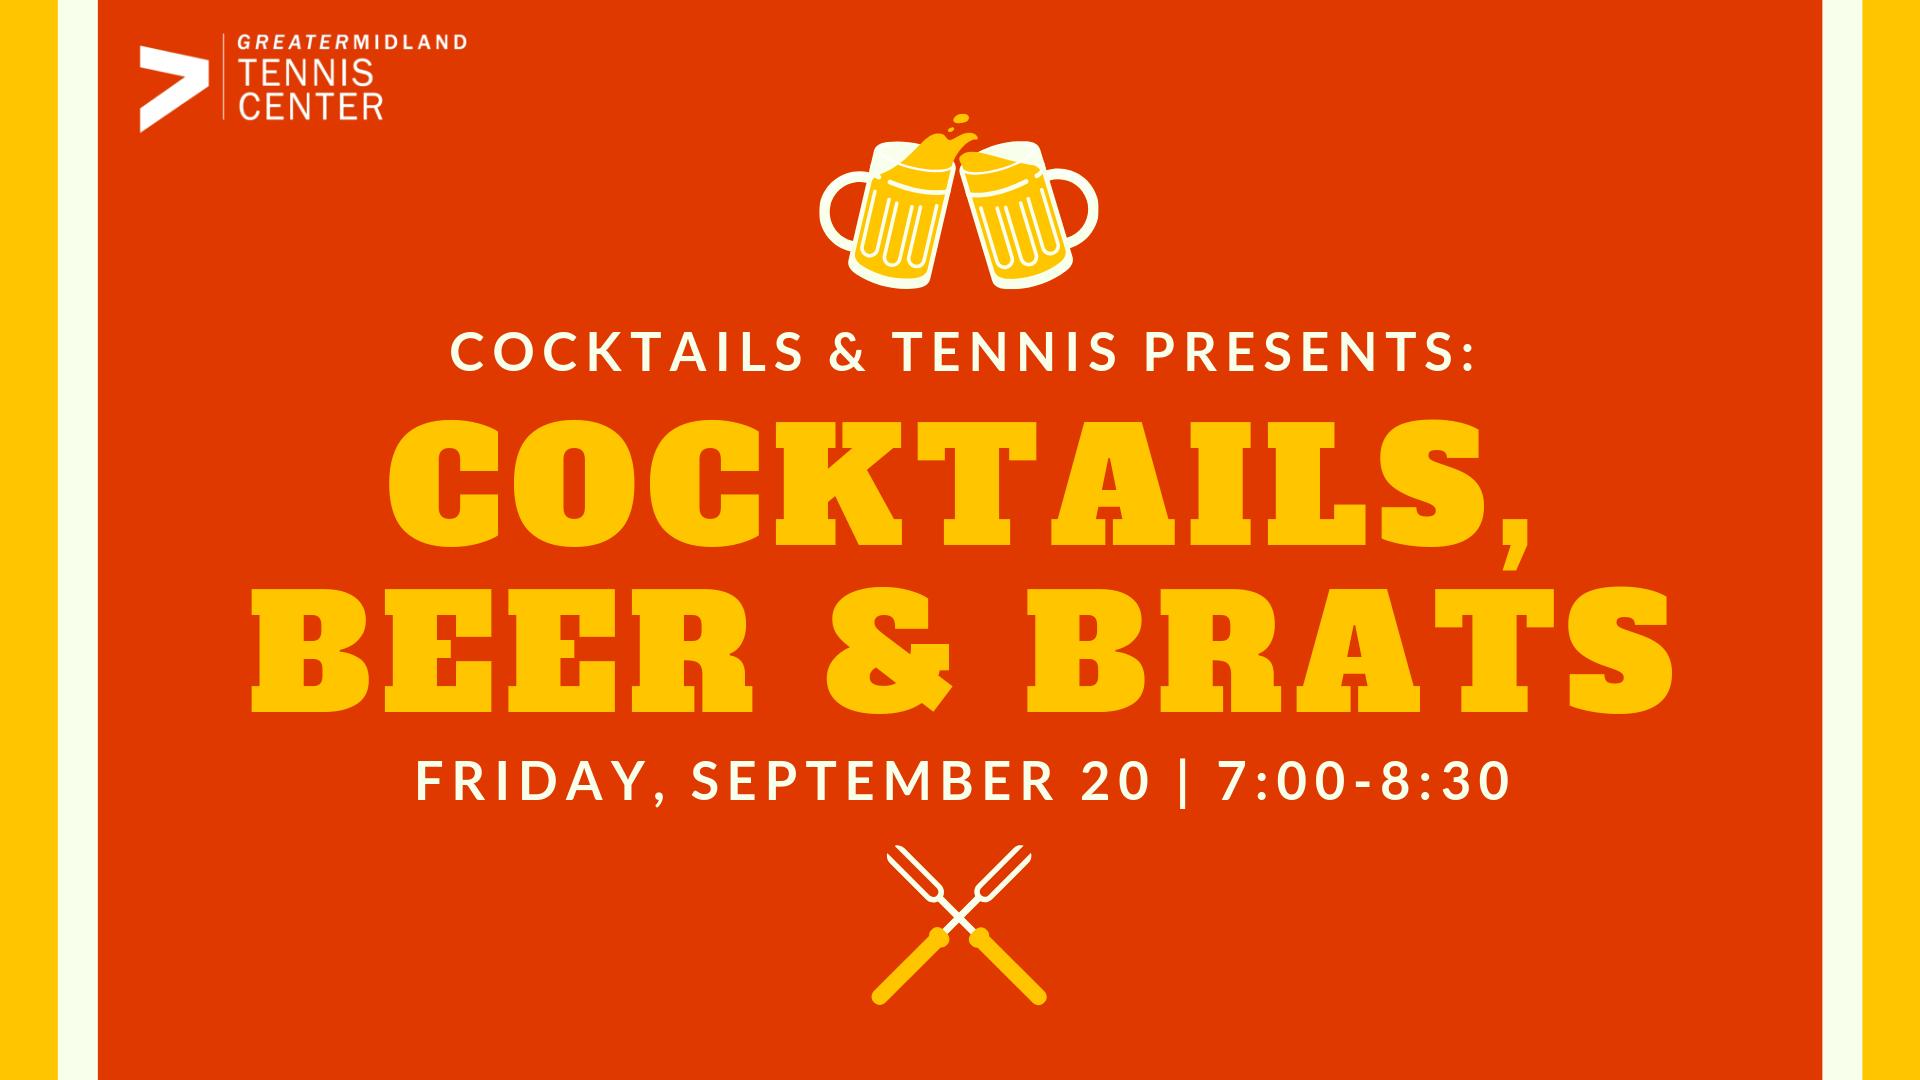 Cocktails, Beers & Brats.png